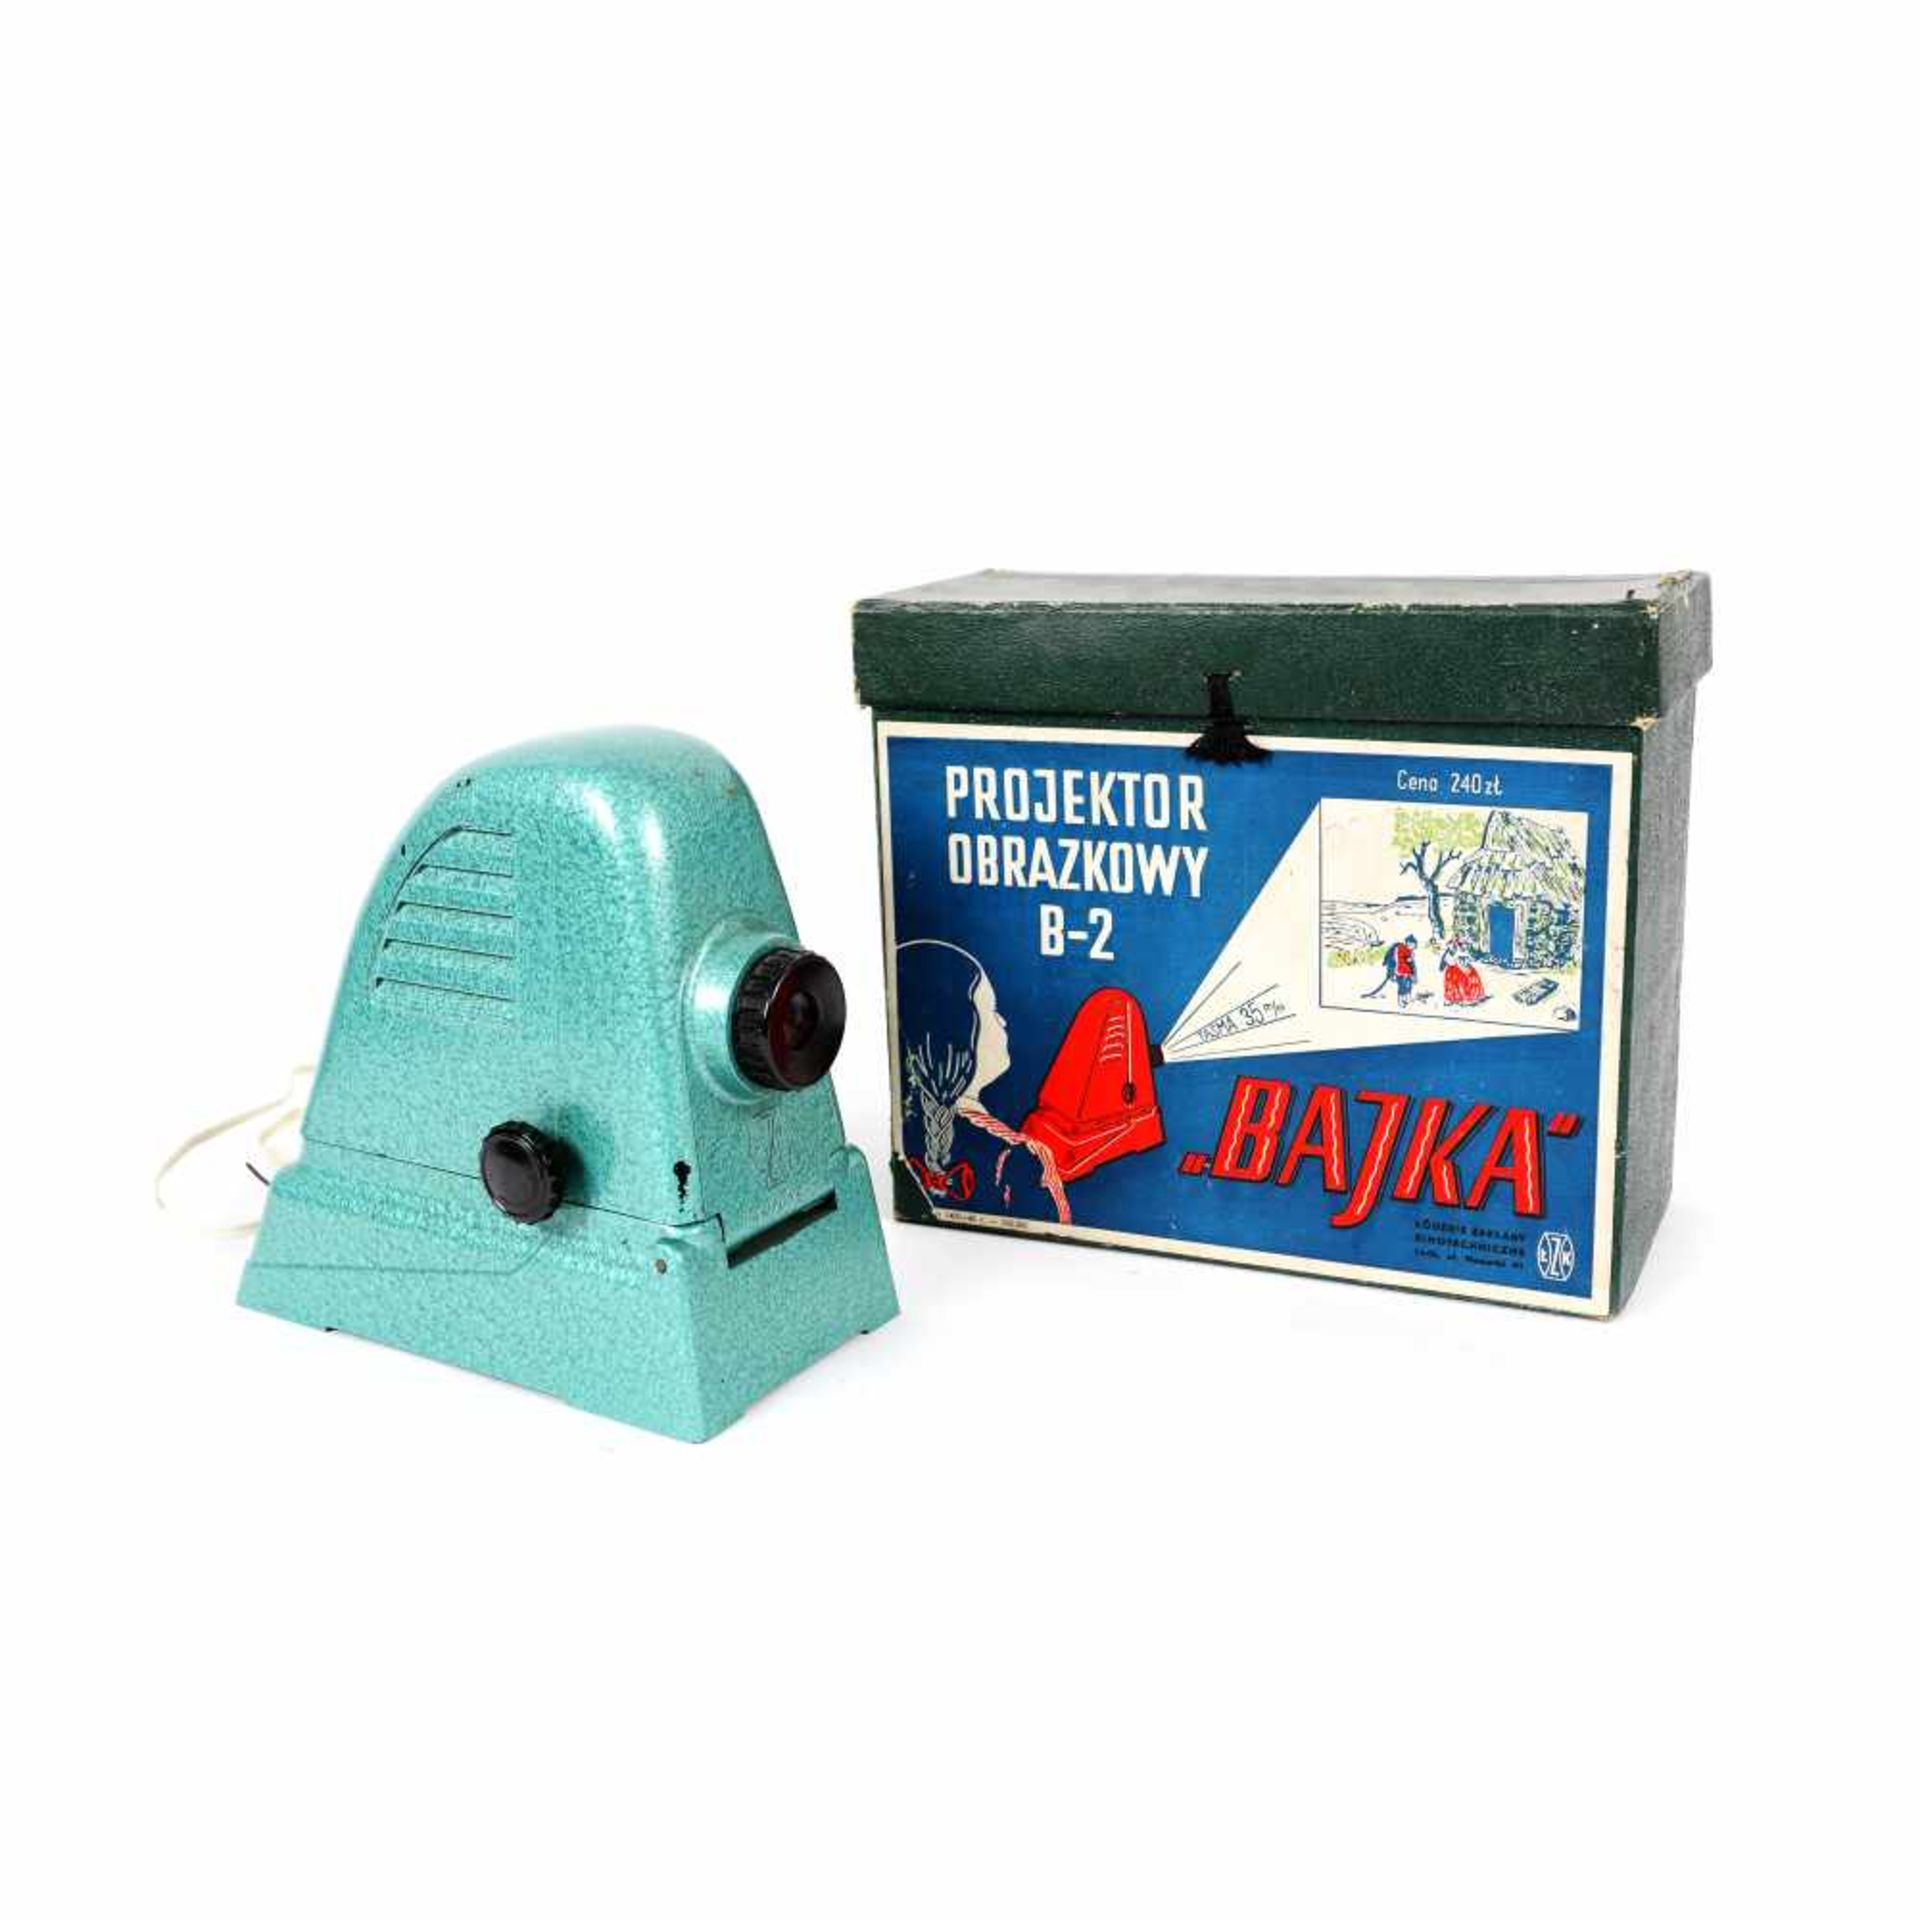 "B-2 ""Bajka"" projector for 35 mm films, Poland, approx. 1950-1960, original box"